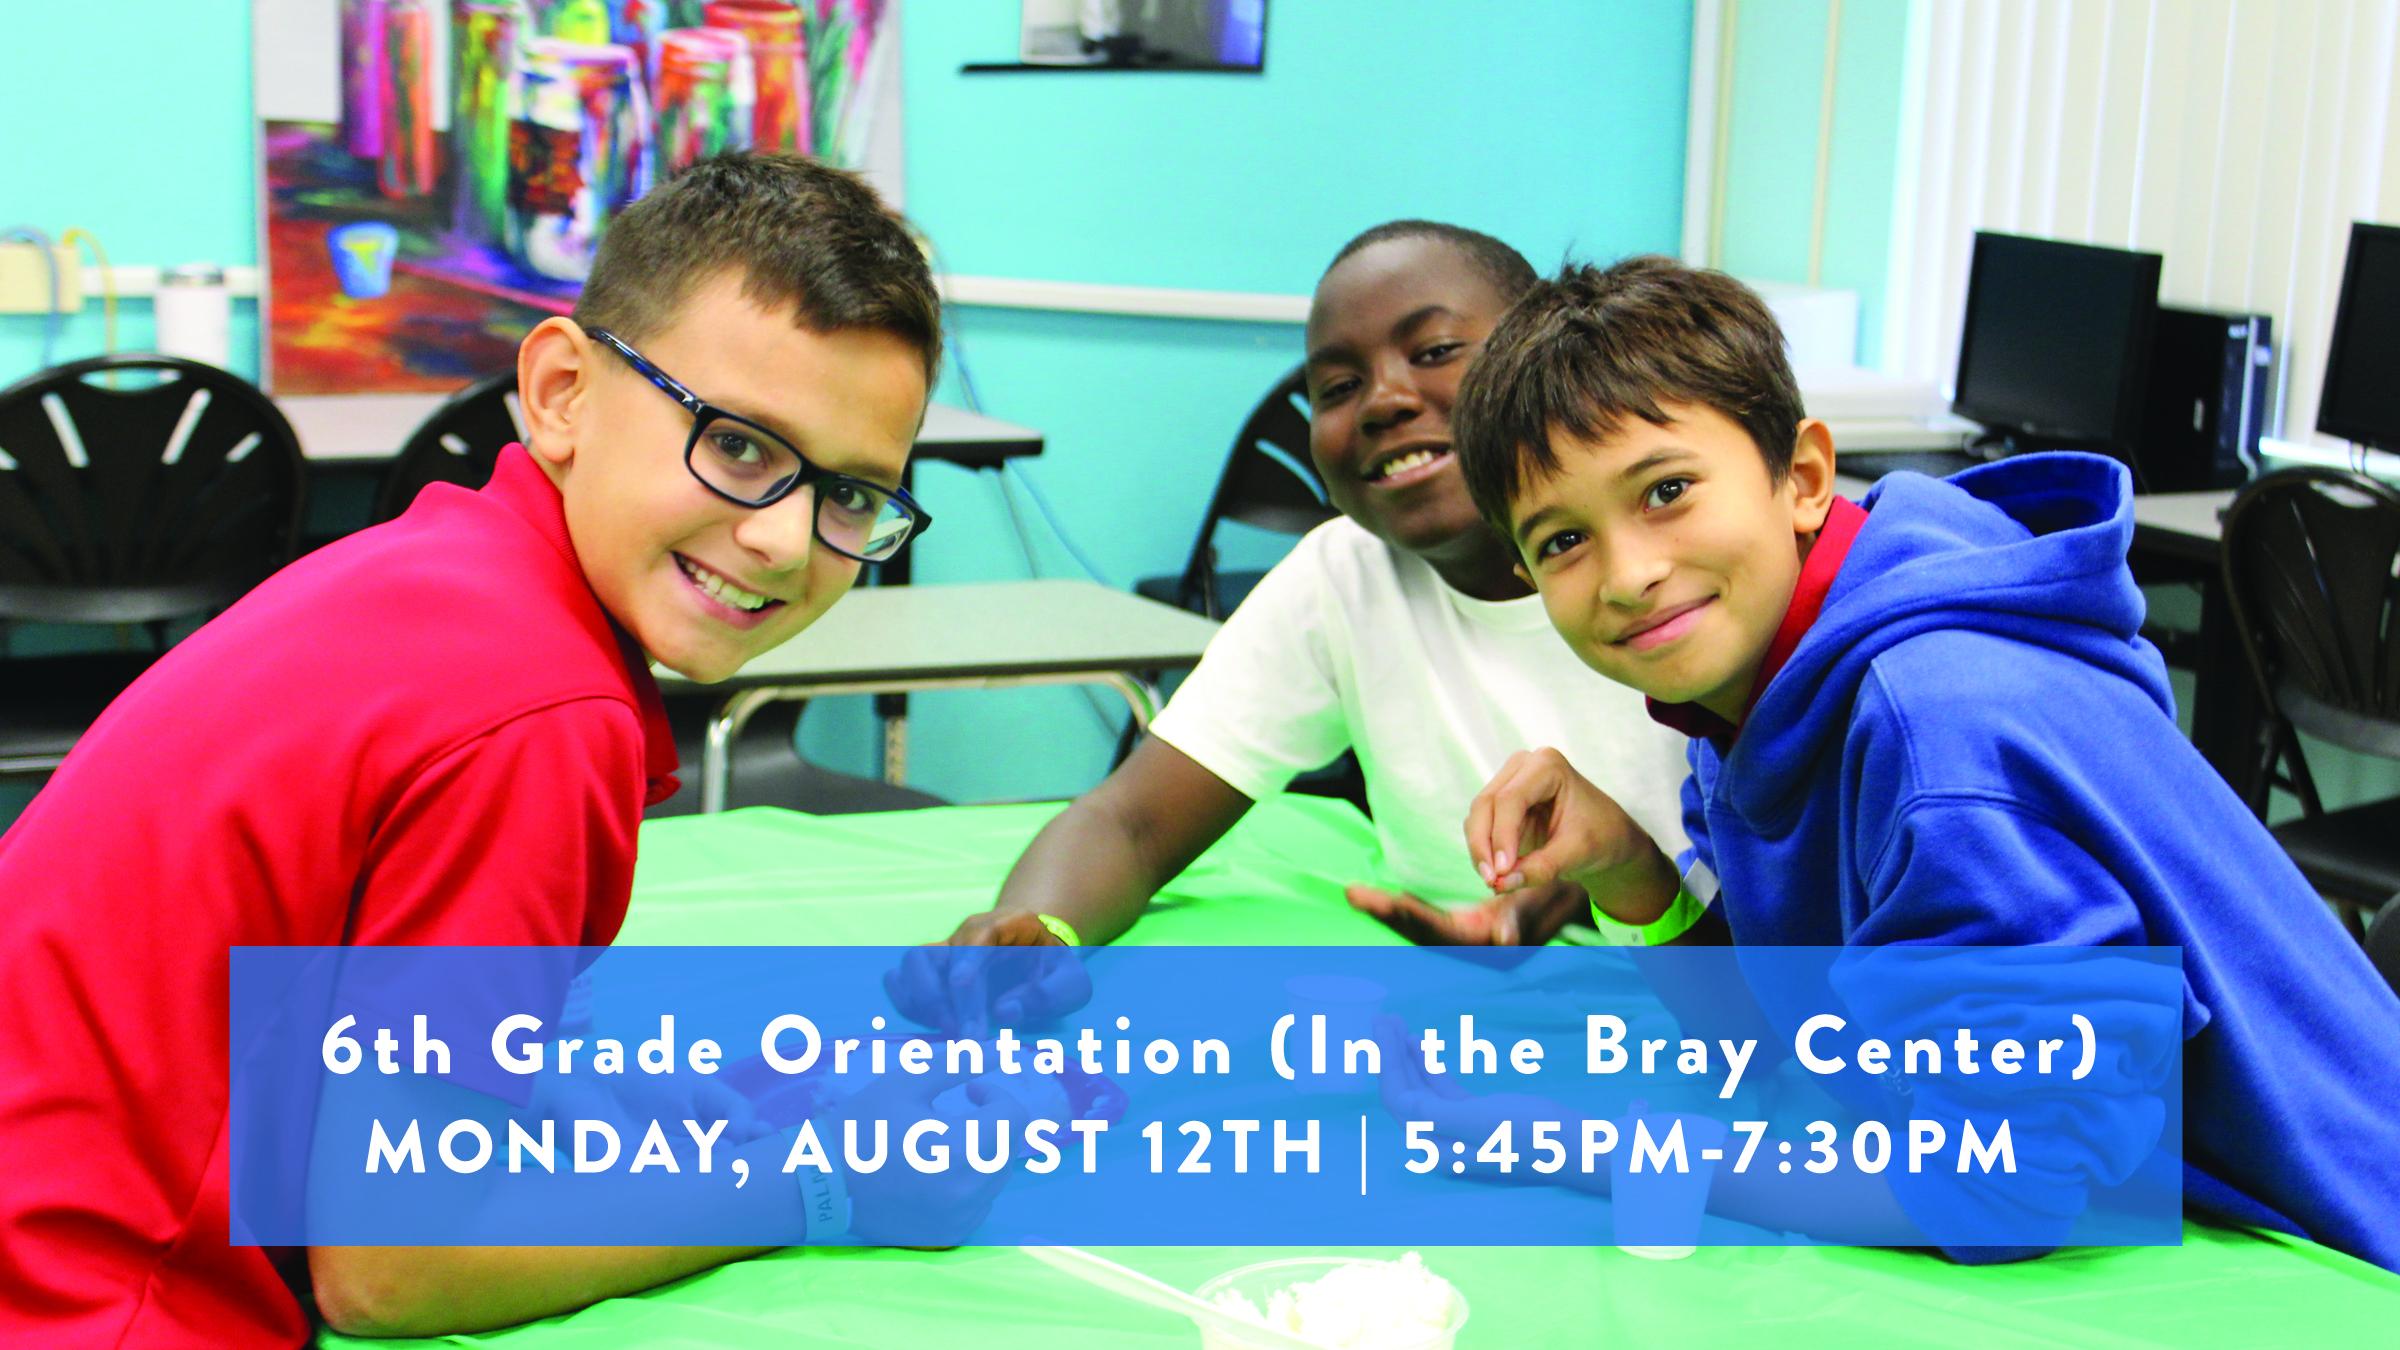 6th Grade Orientation (In the Bray Center).jpg